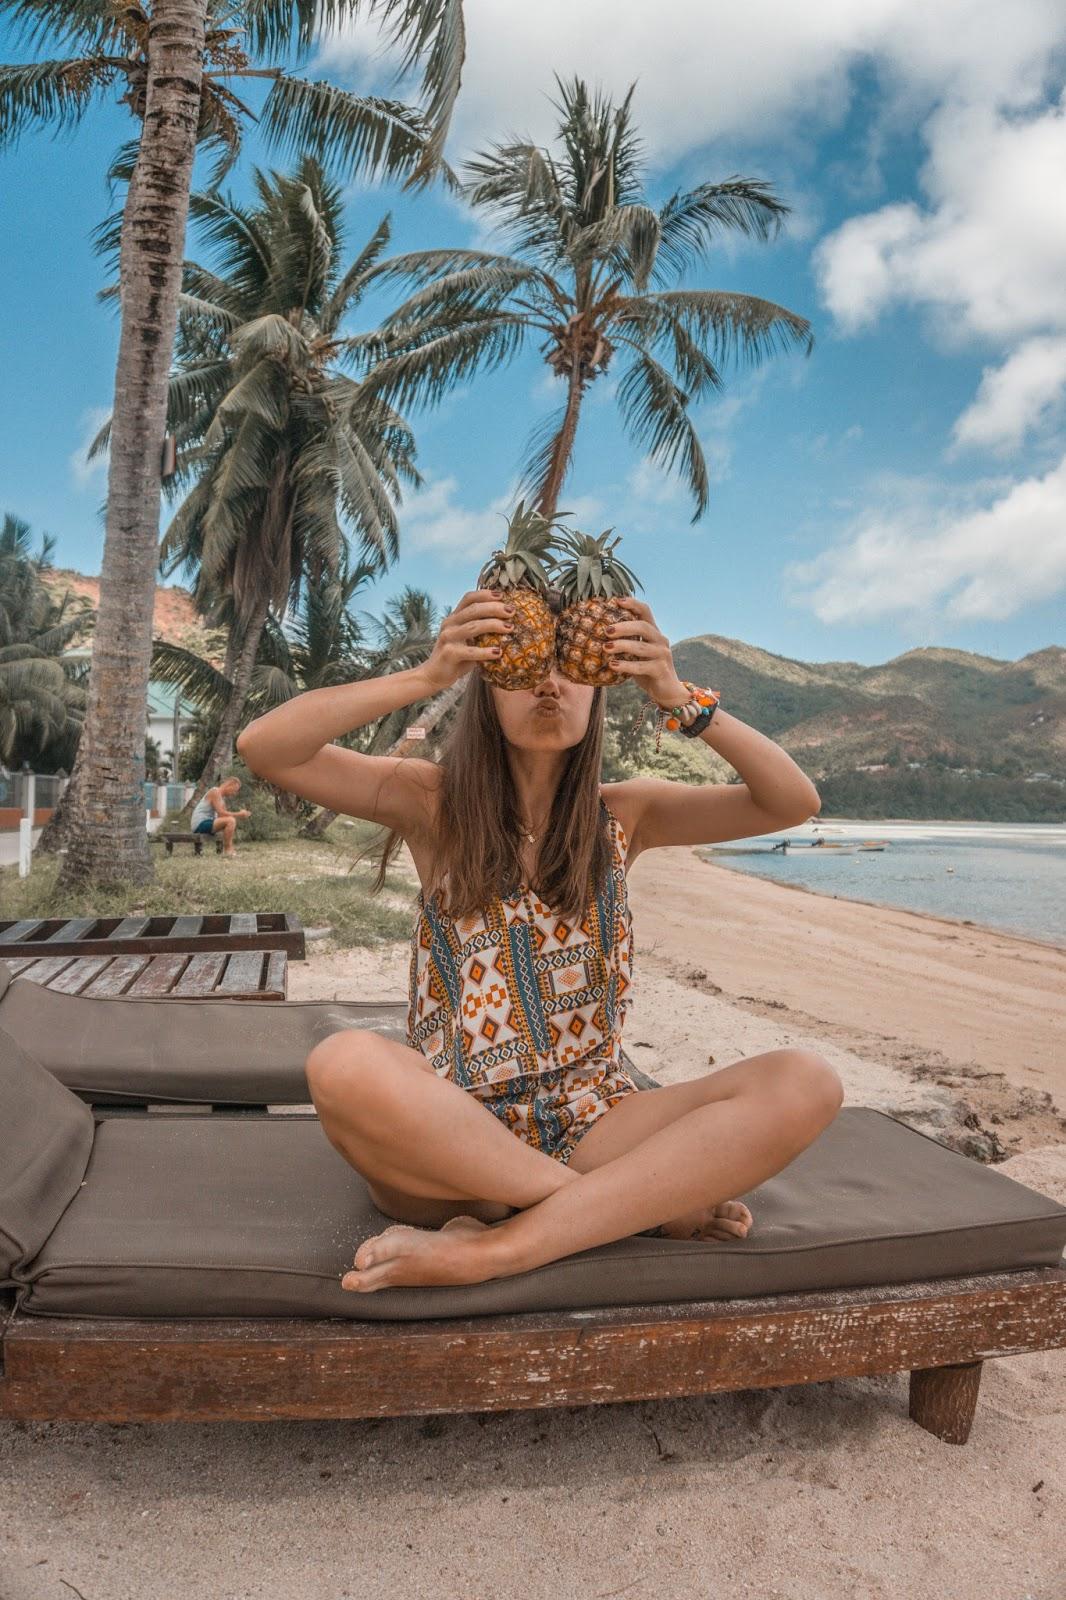 Seychelles, travel girl, Seychelles island, paradise island, Seychelles vacations, Praslin Island, amazing beach, travel women